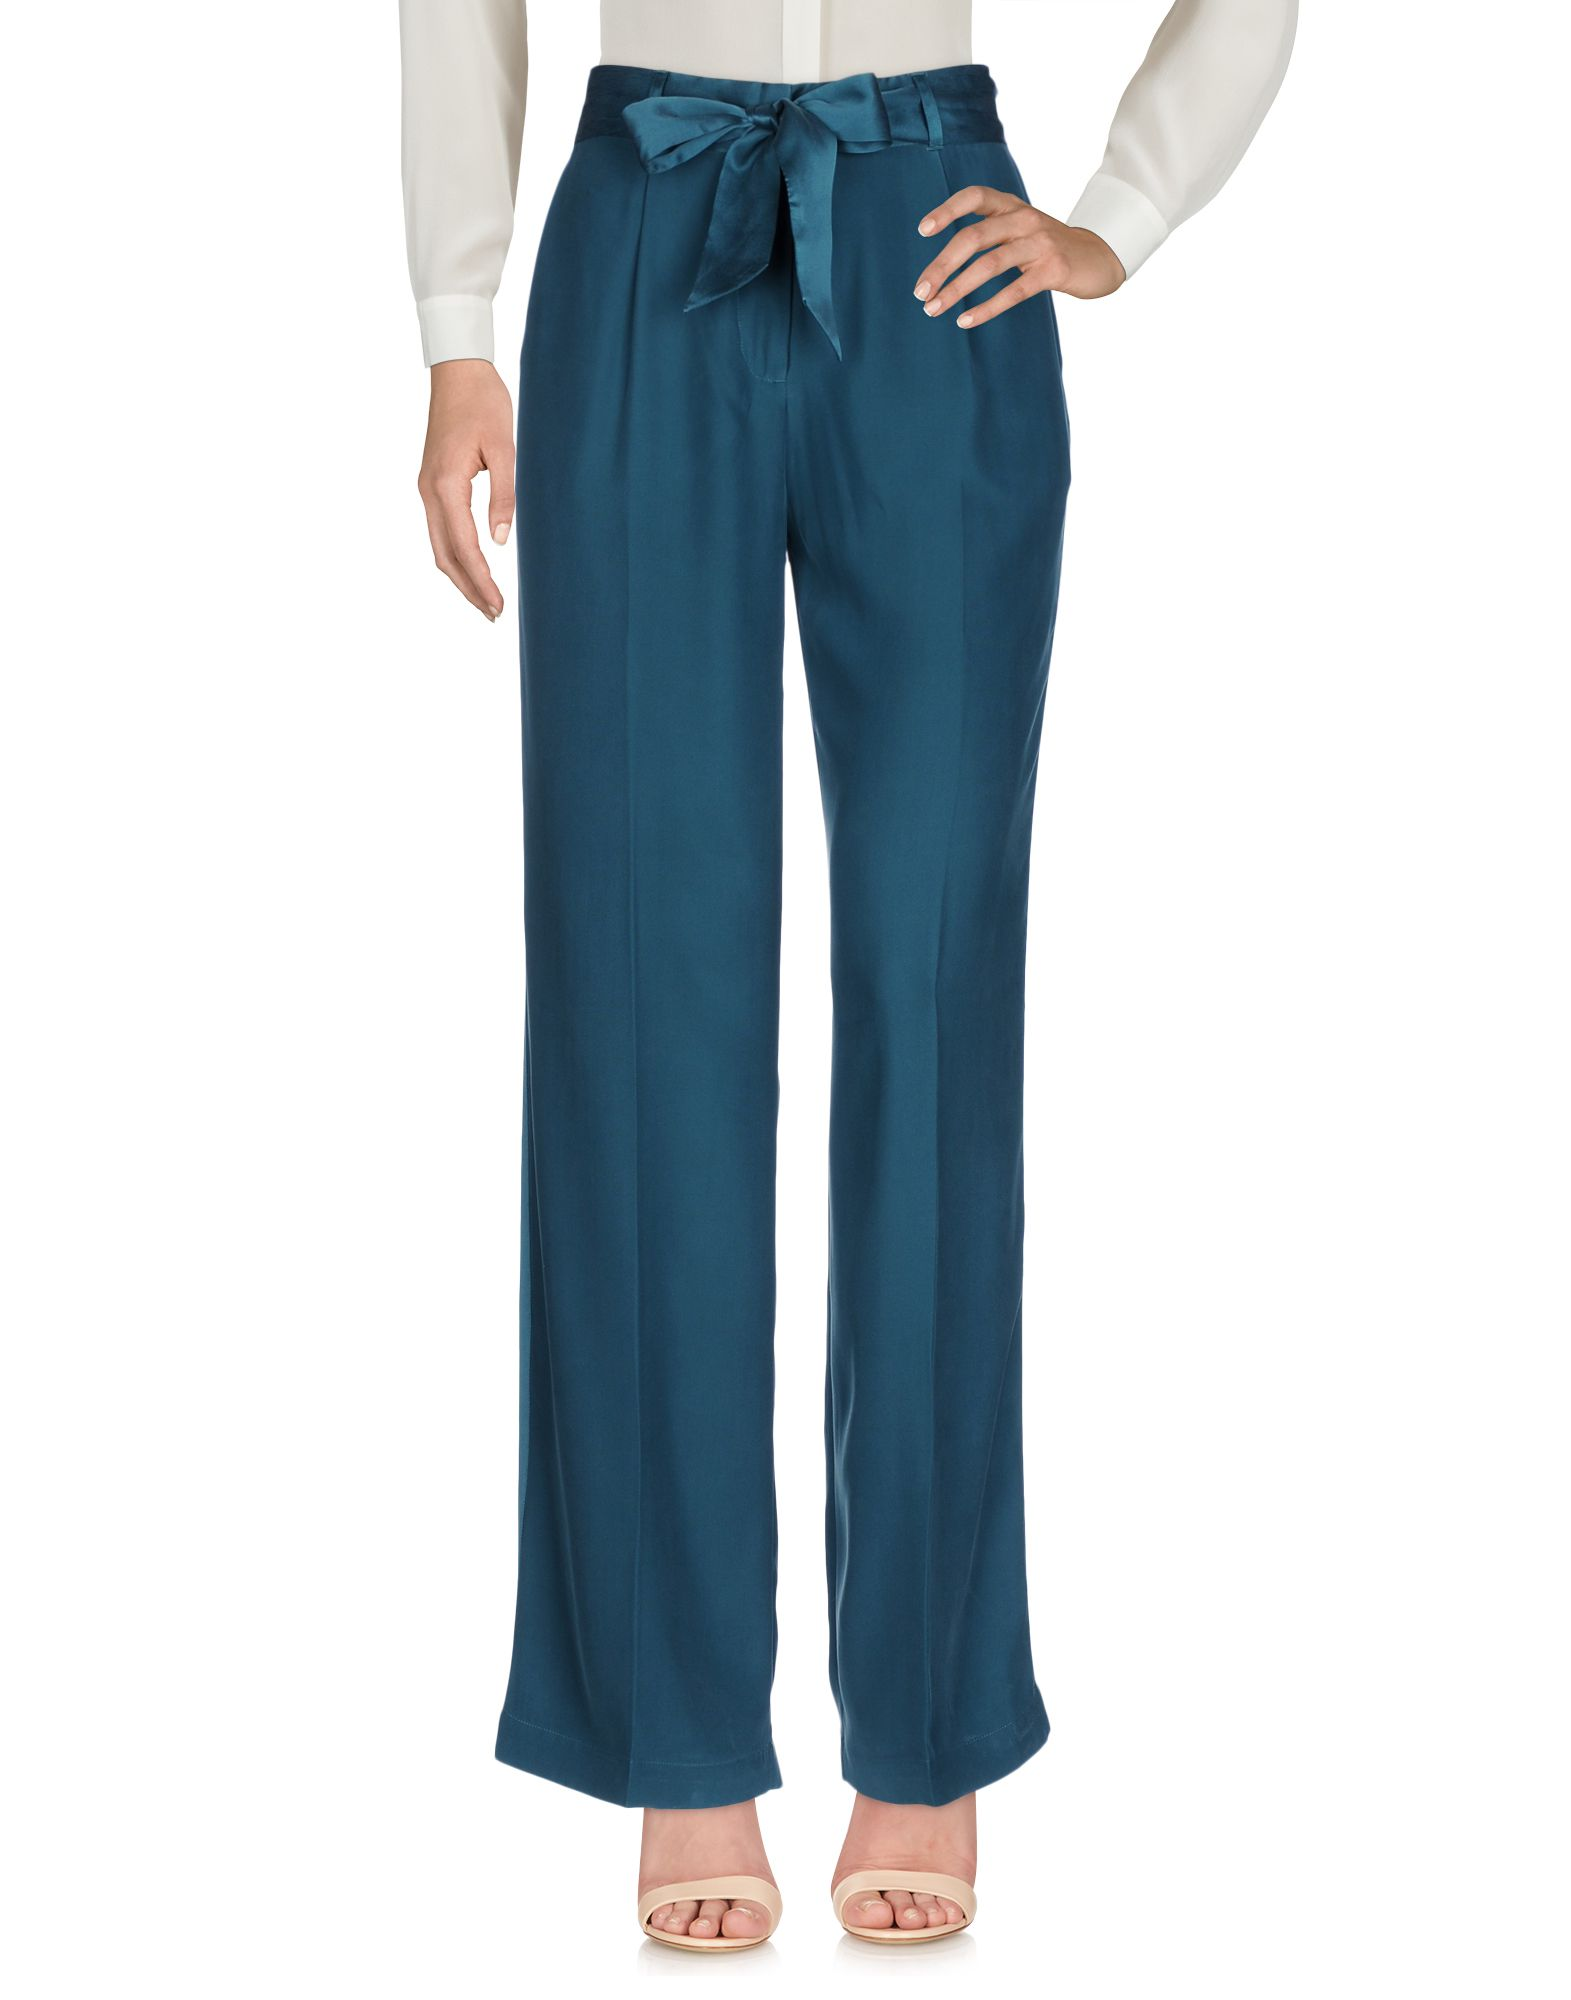 Pantalone Equipment Donna - Acquista online su H3N5NNki